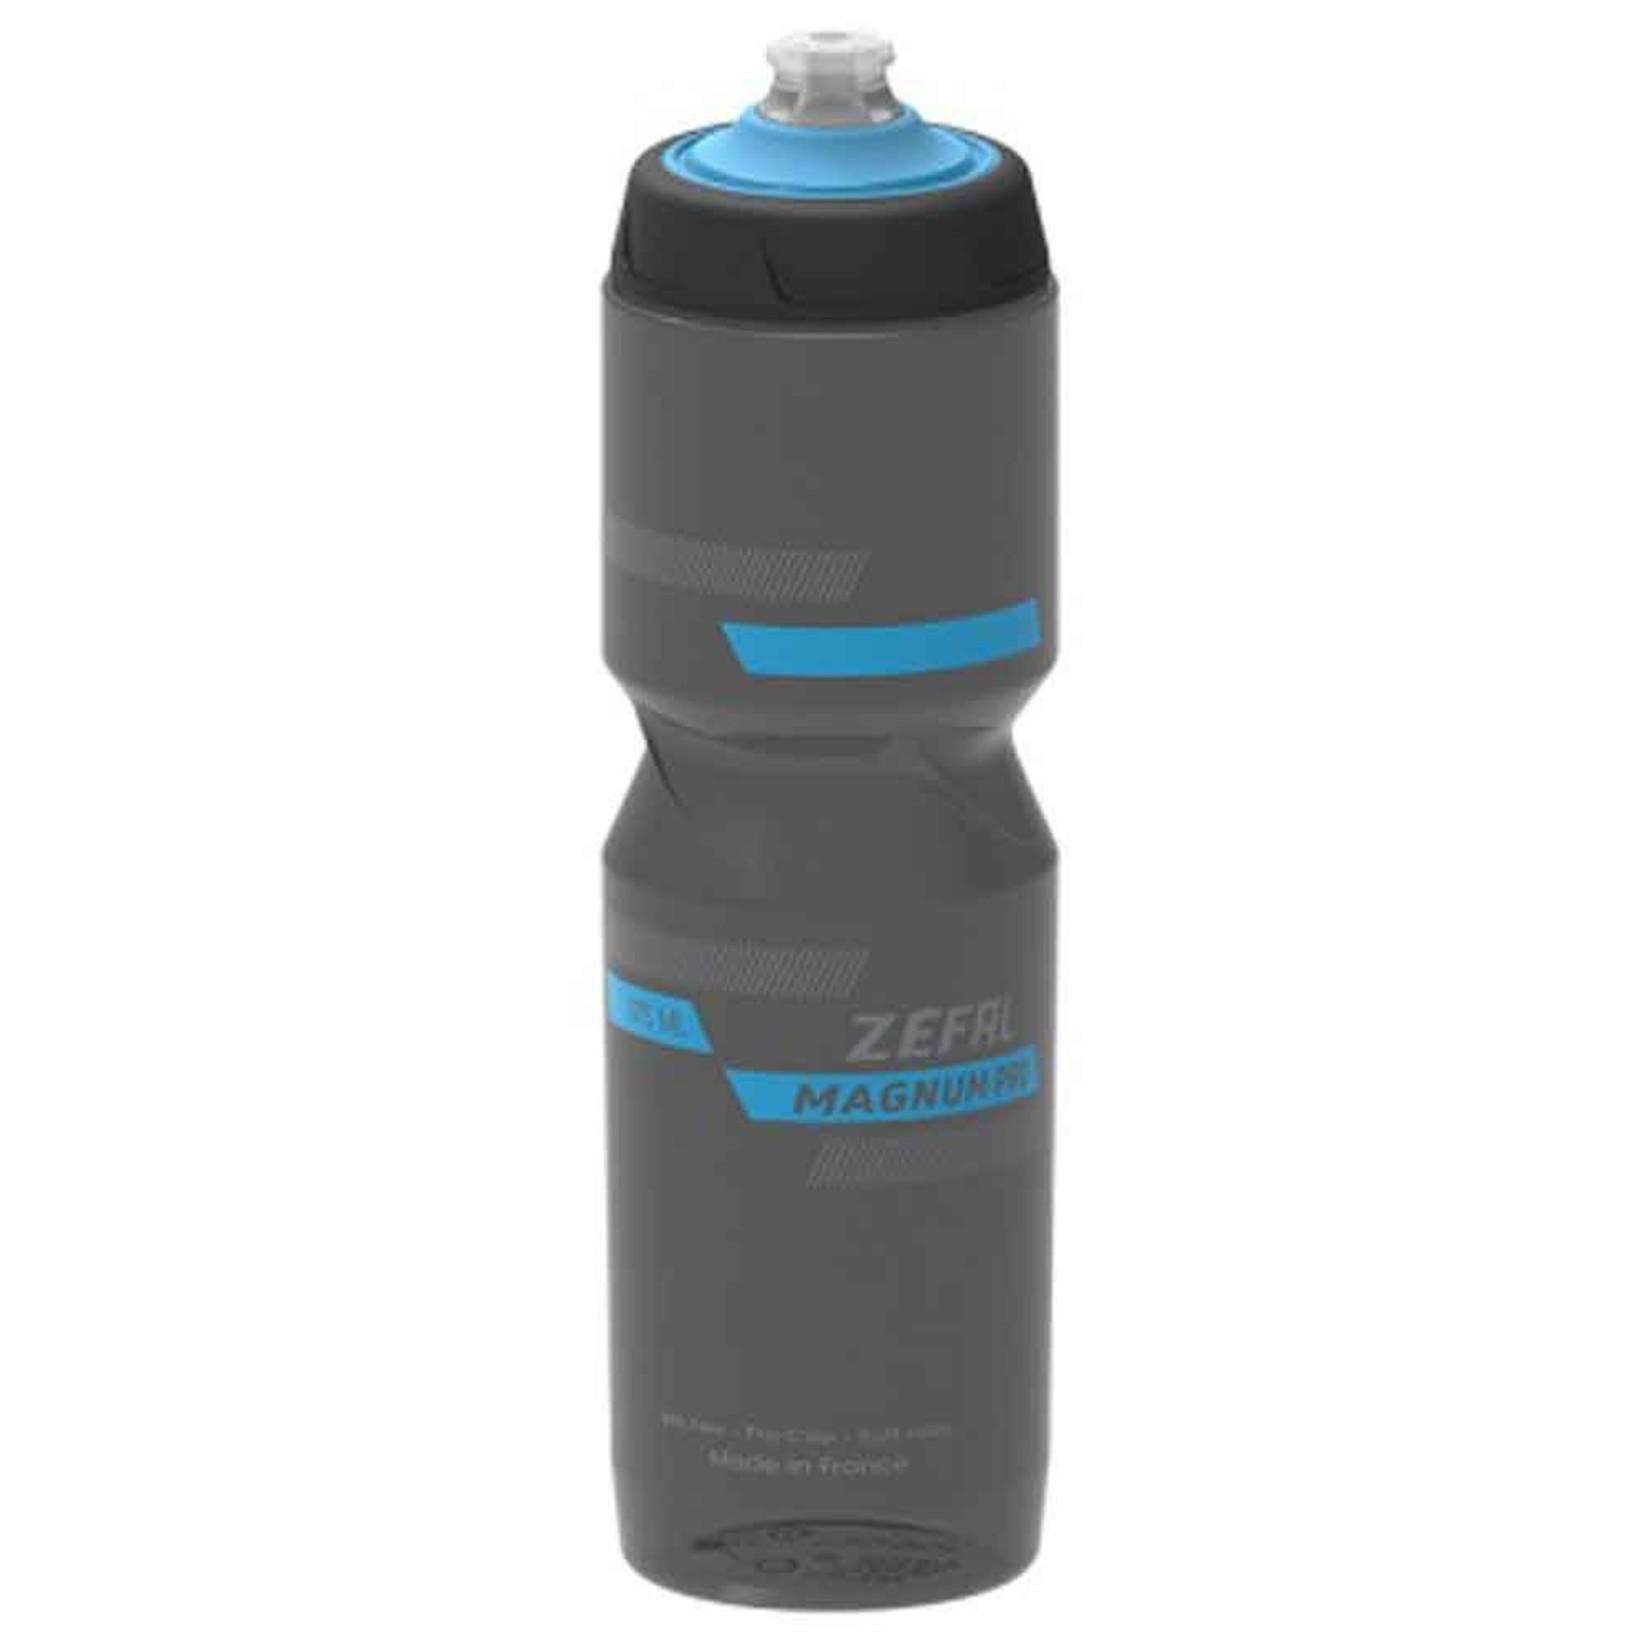 Zefal Zefal, Magnum Pro 975ML Water Bottle